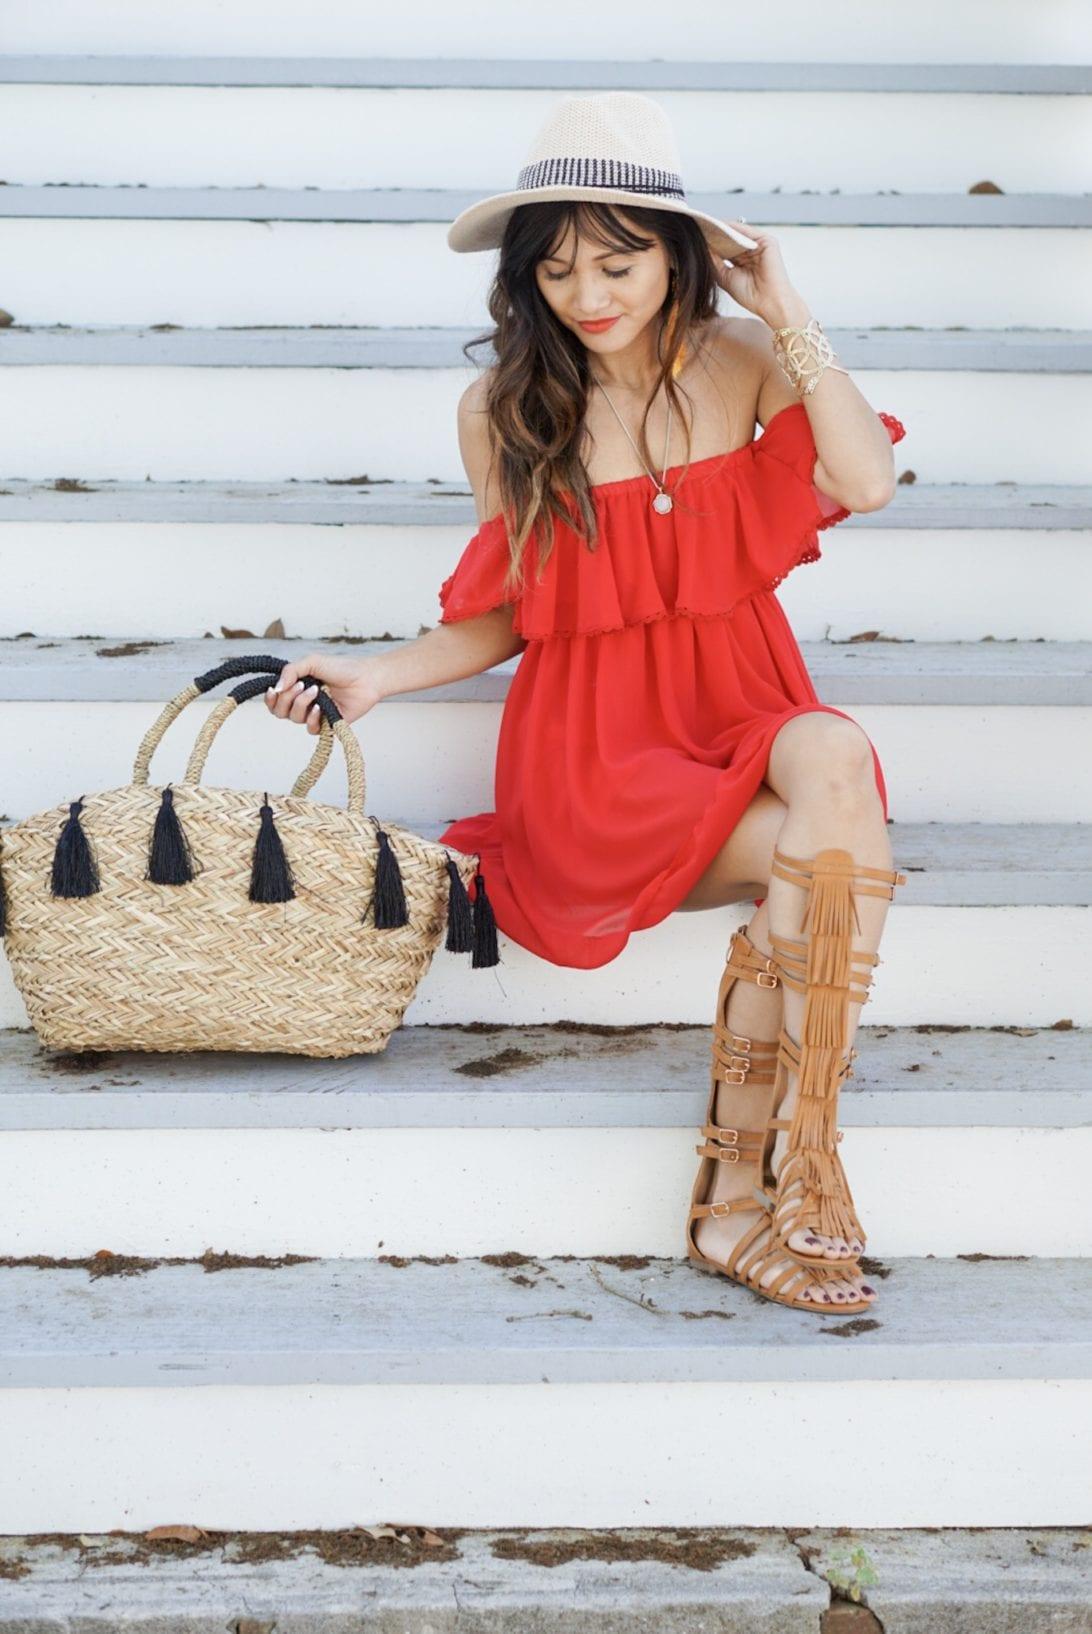 red dress, tire swing, galveston, beach style, summer style. off the shoulder, gladiators, tassel bag